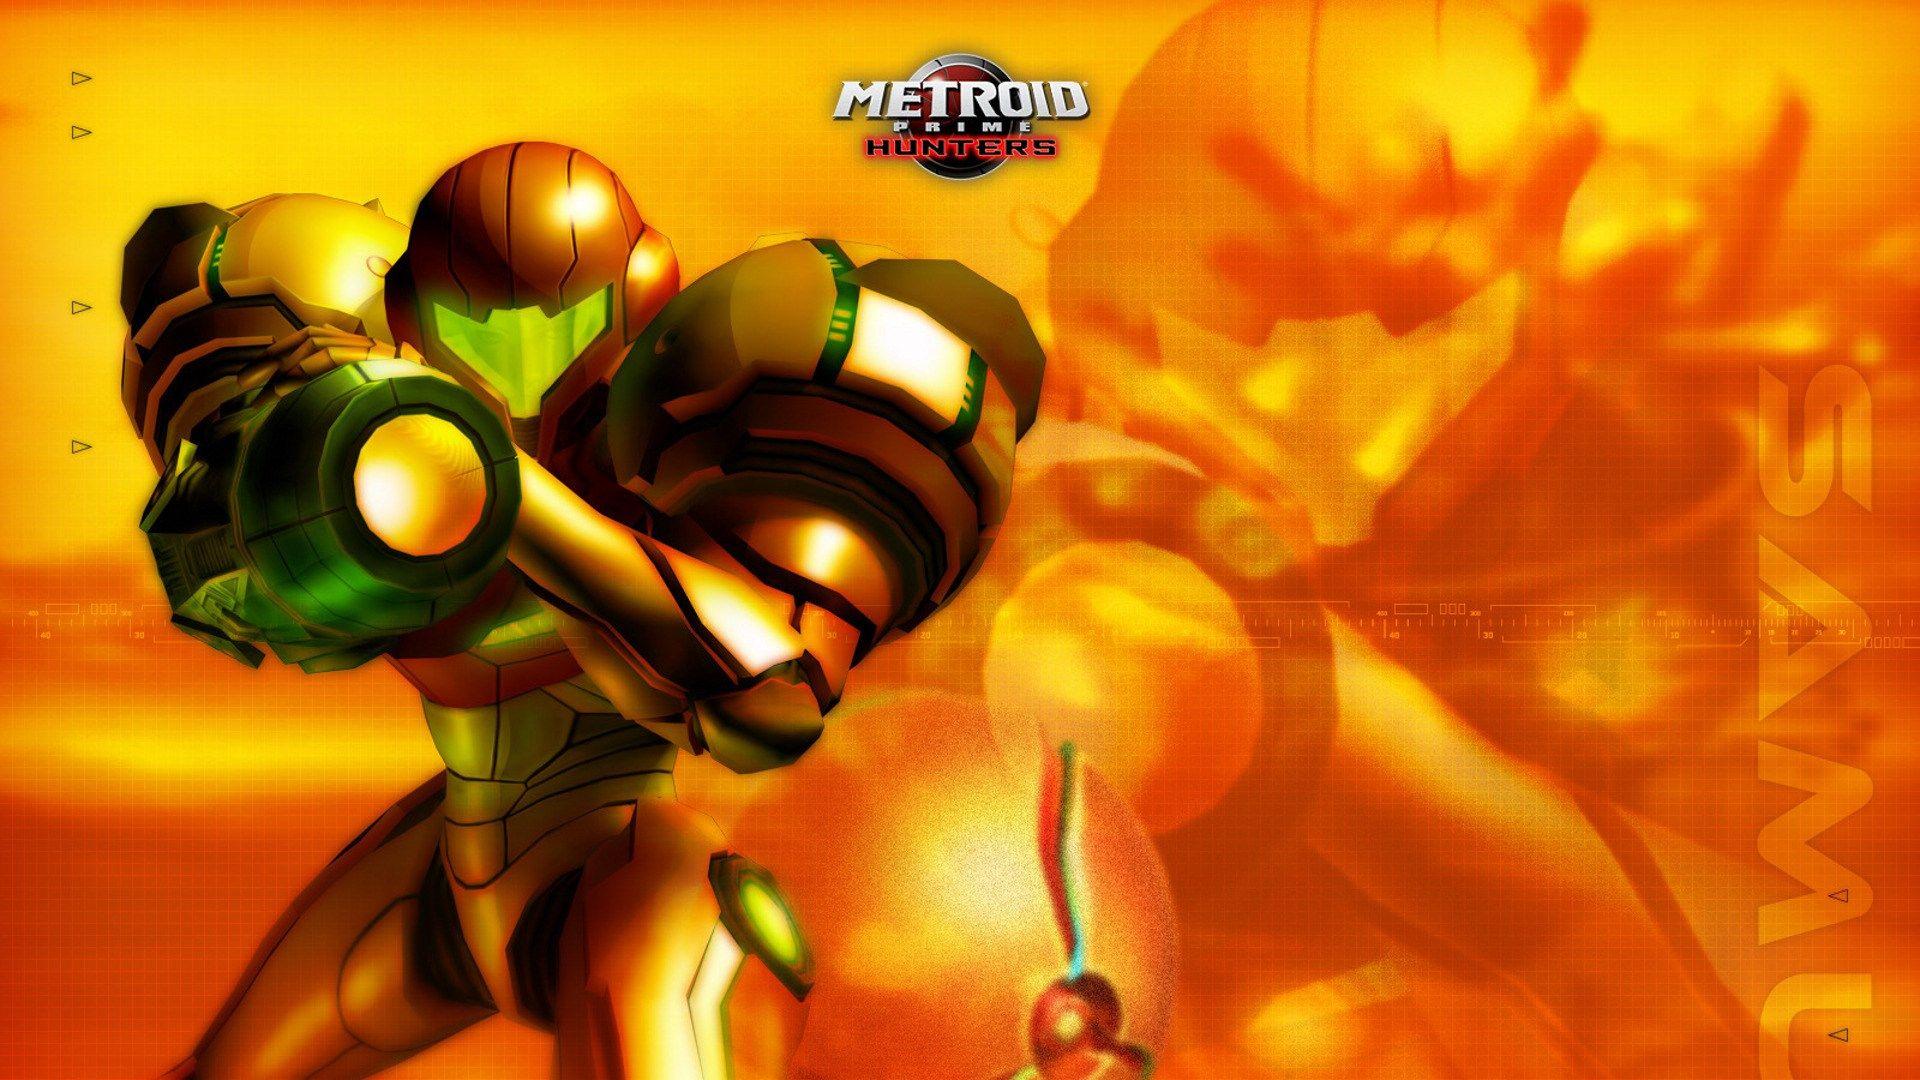 1920x1080 Widescreen Wallpaper Metroid Prime Hunters Metroid Prime Metroid Hunter Games